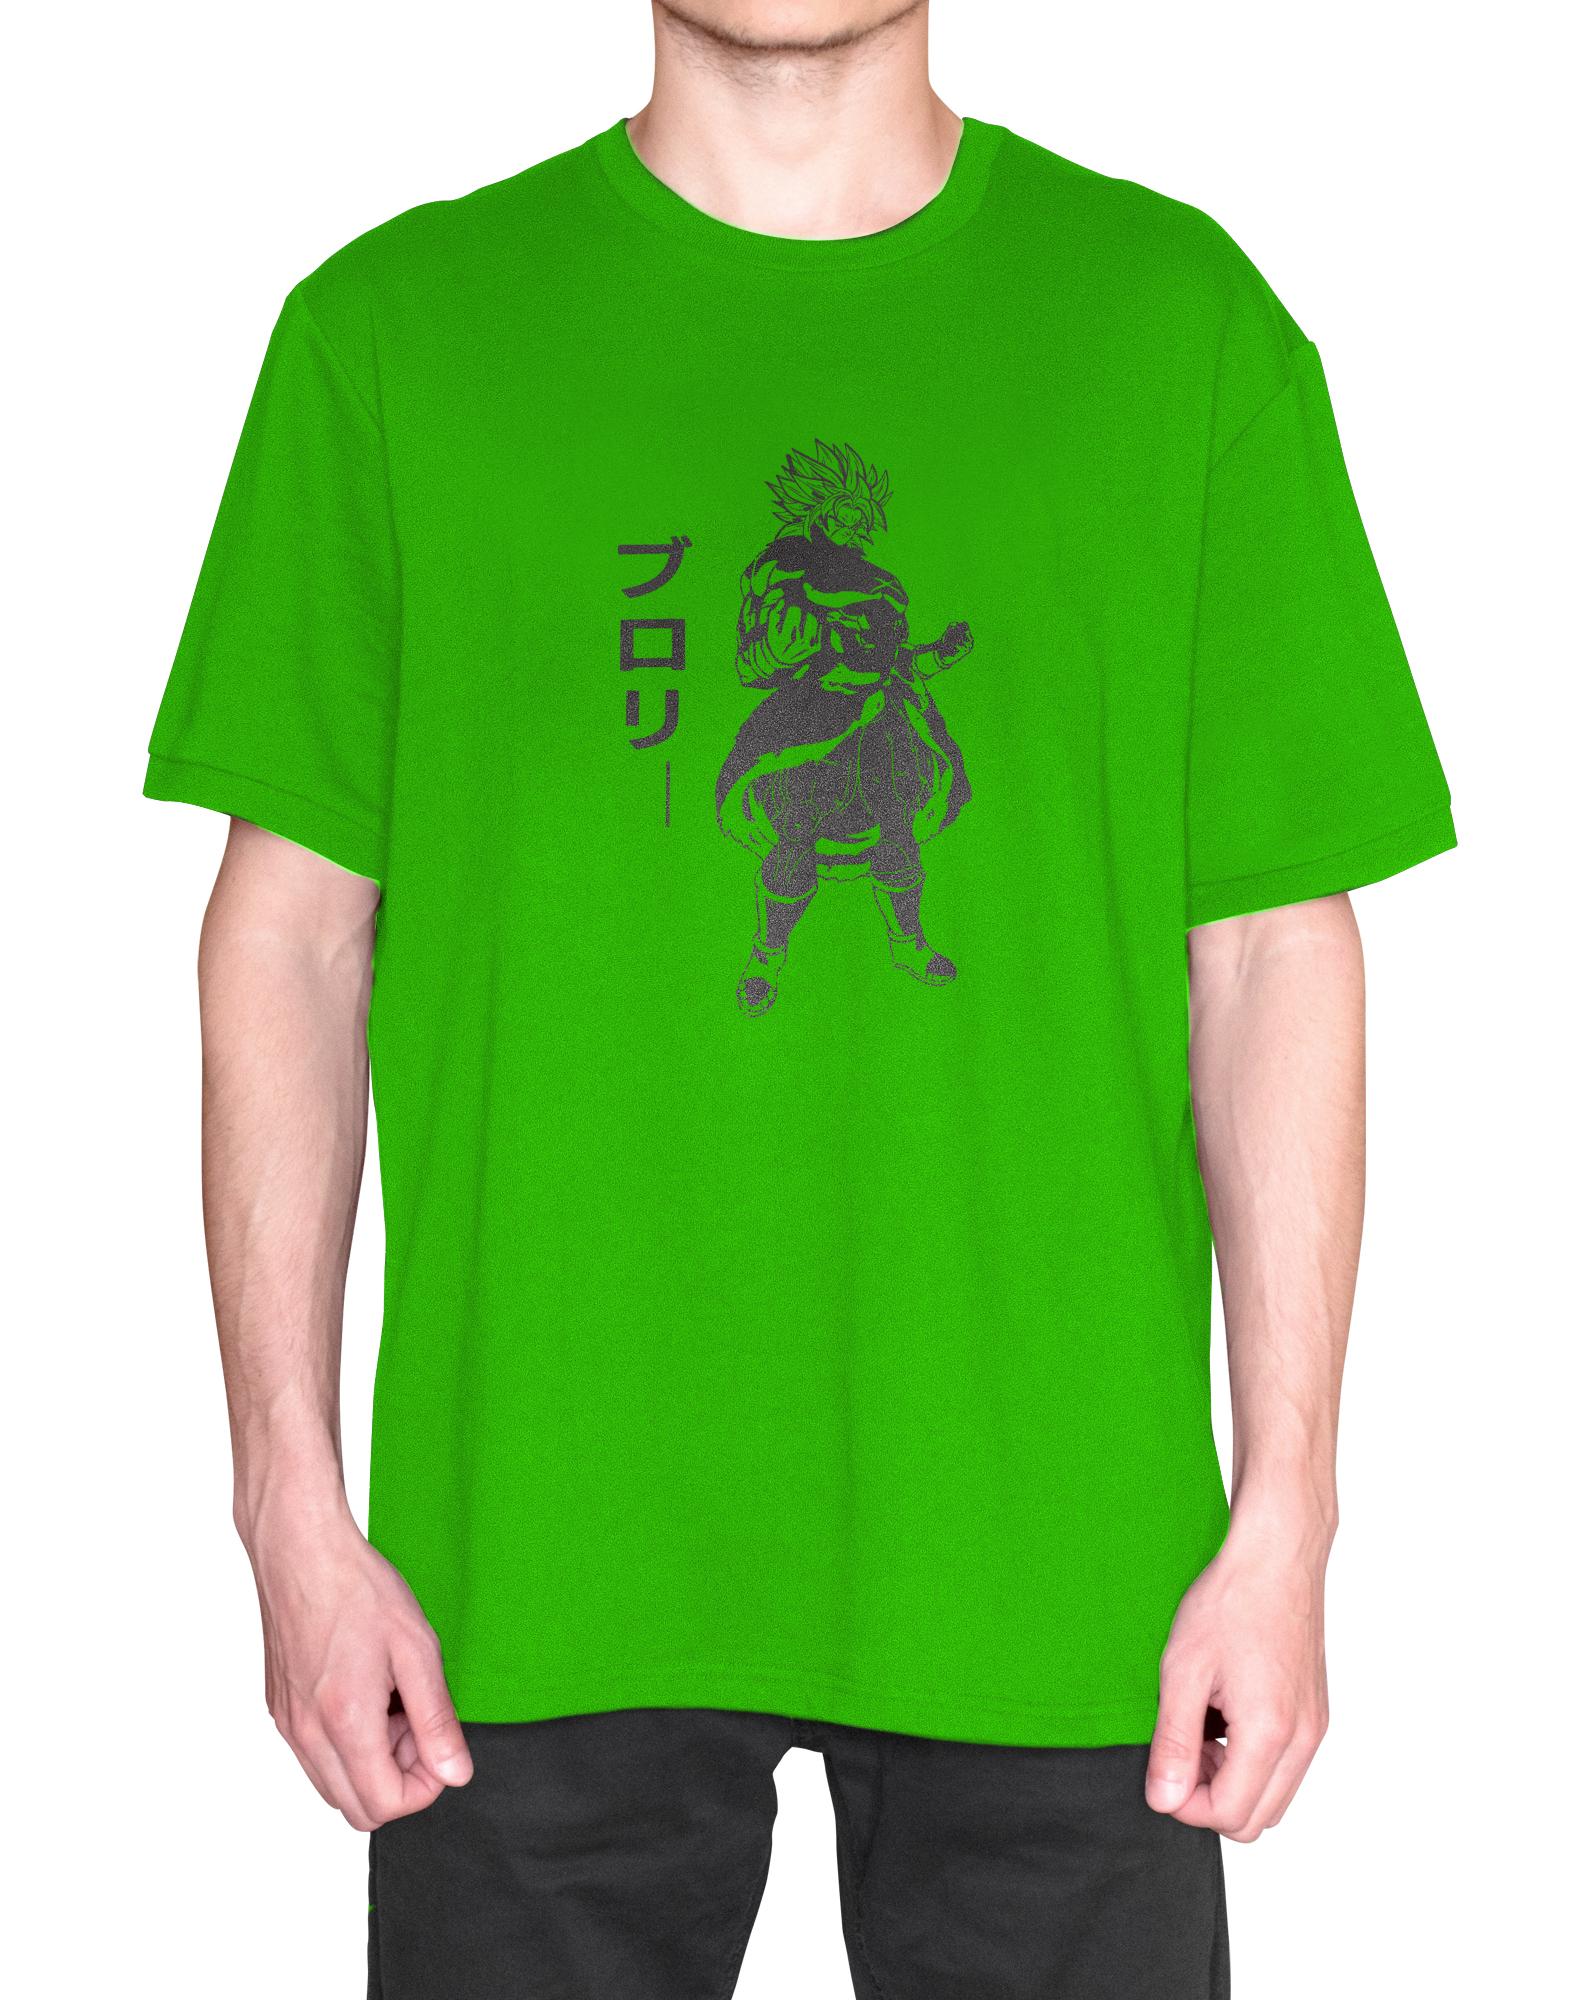 Broly Legendary Full Blooded Saiyan T-Shirt